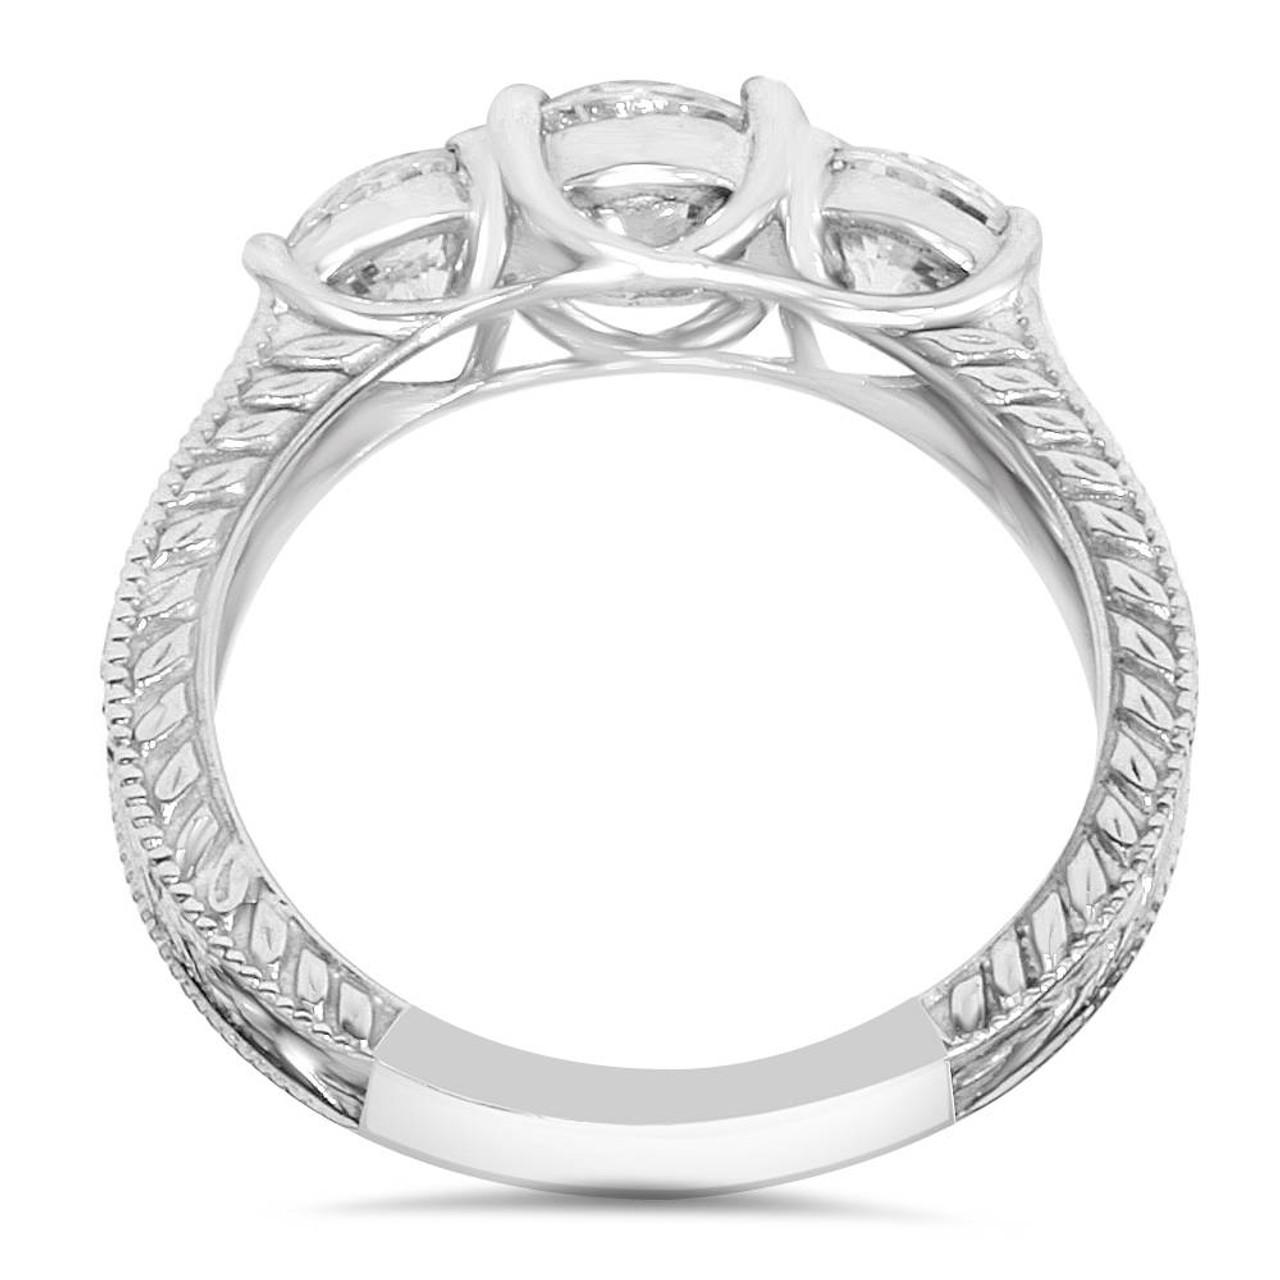 84481ce8ad808 1 3/4ct Vintage Three Stone Round Diamond Engagement Ring 14K White Gold  (H, SI2)